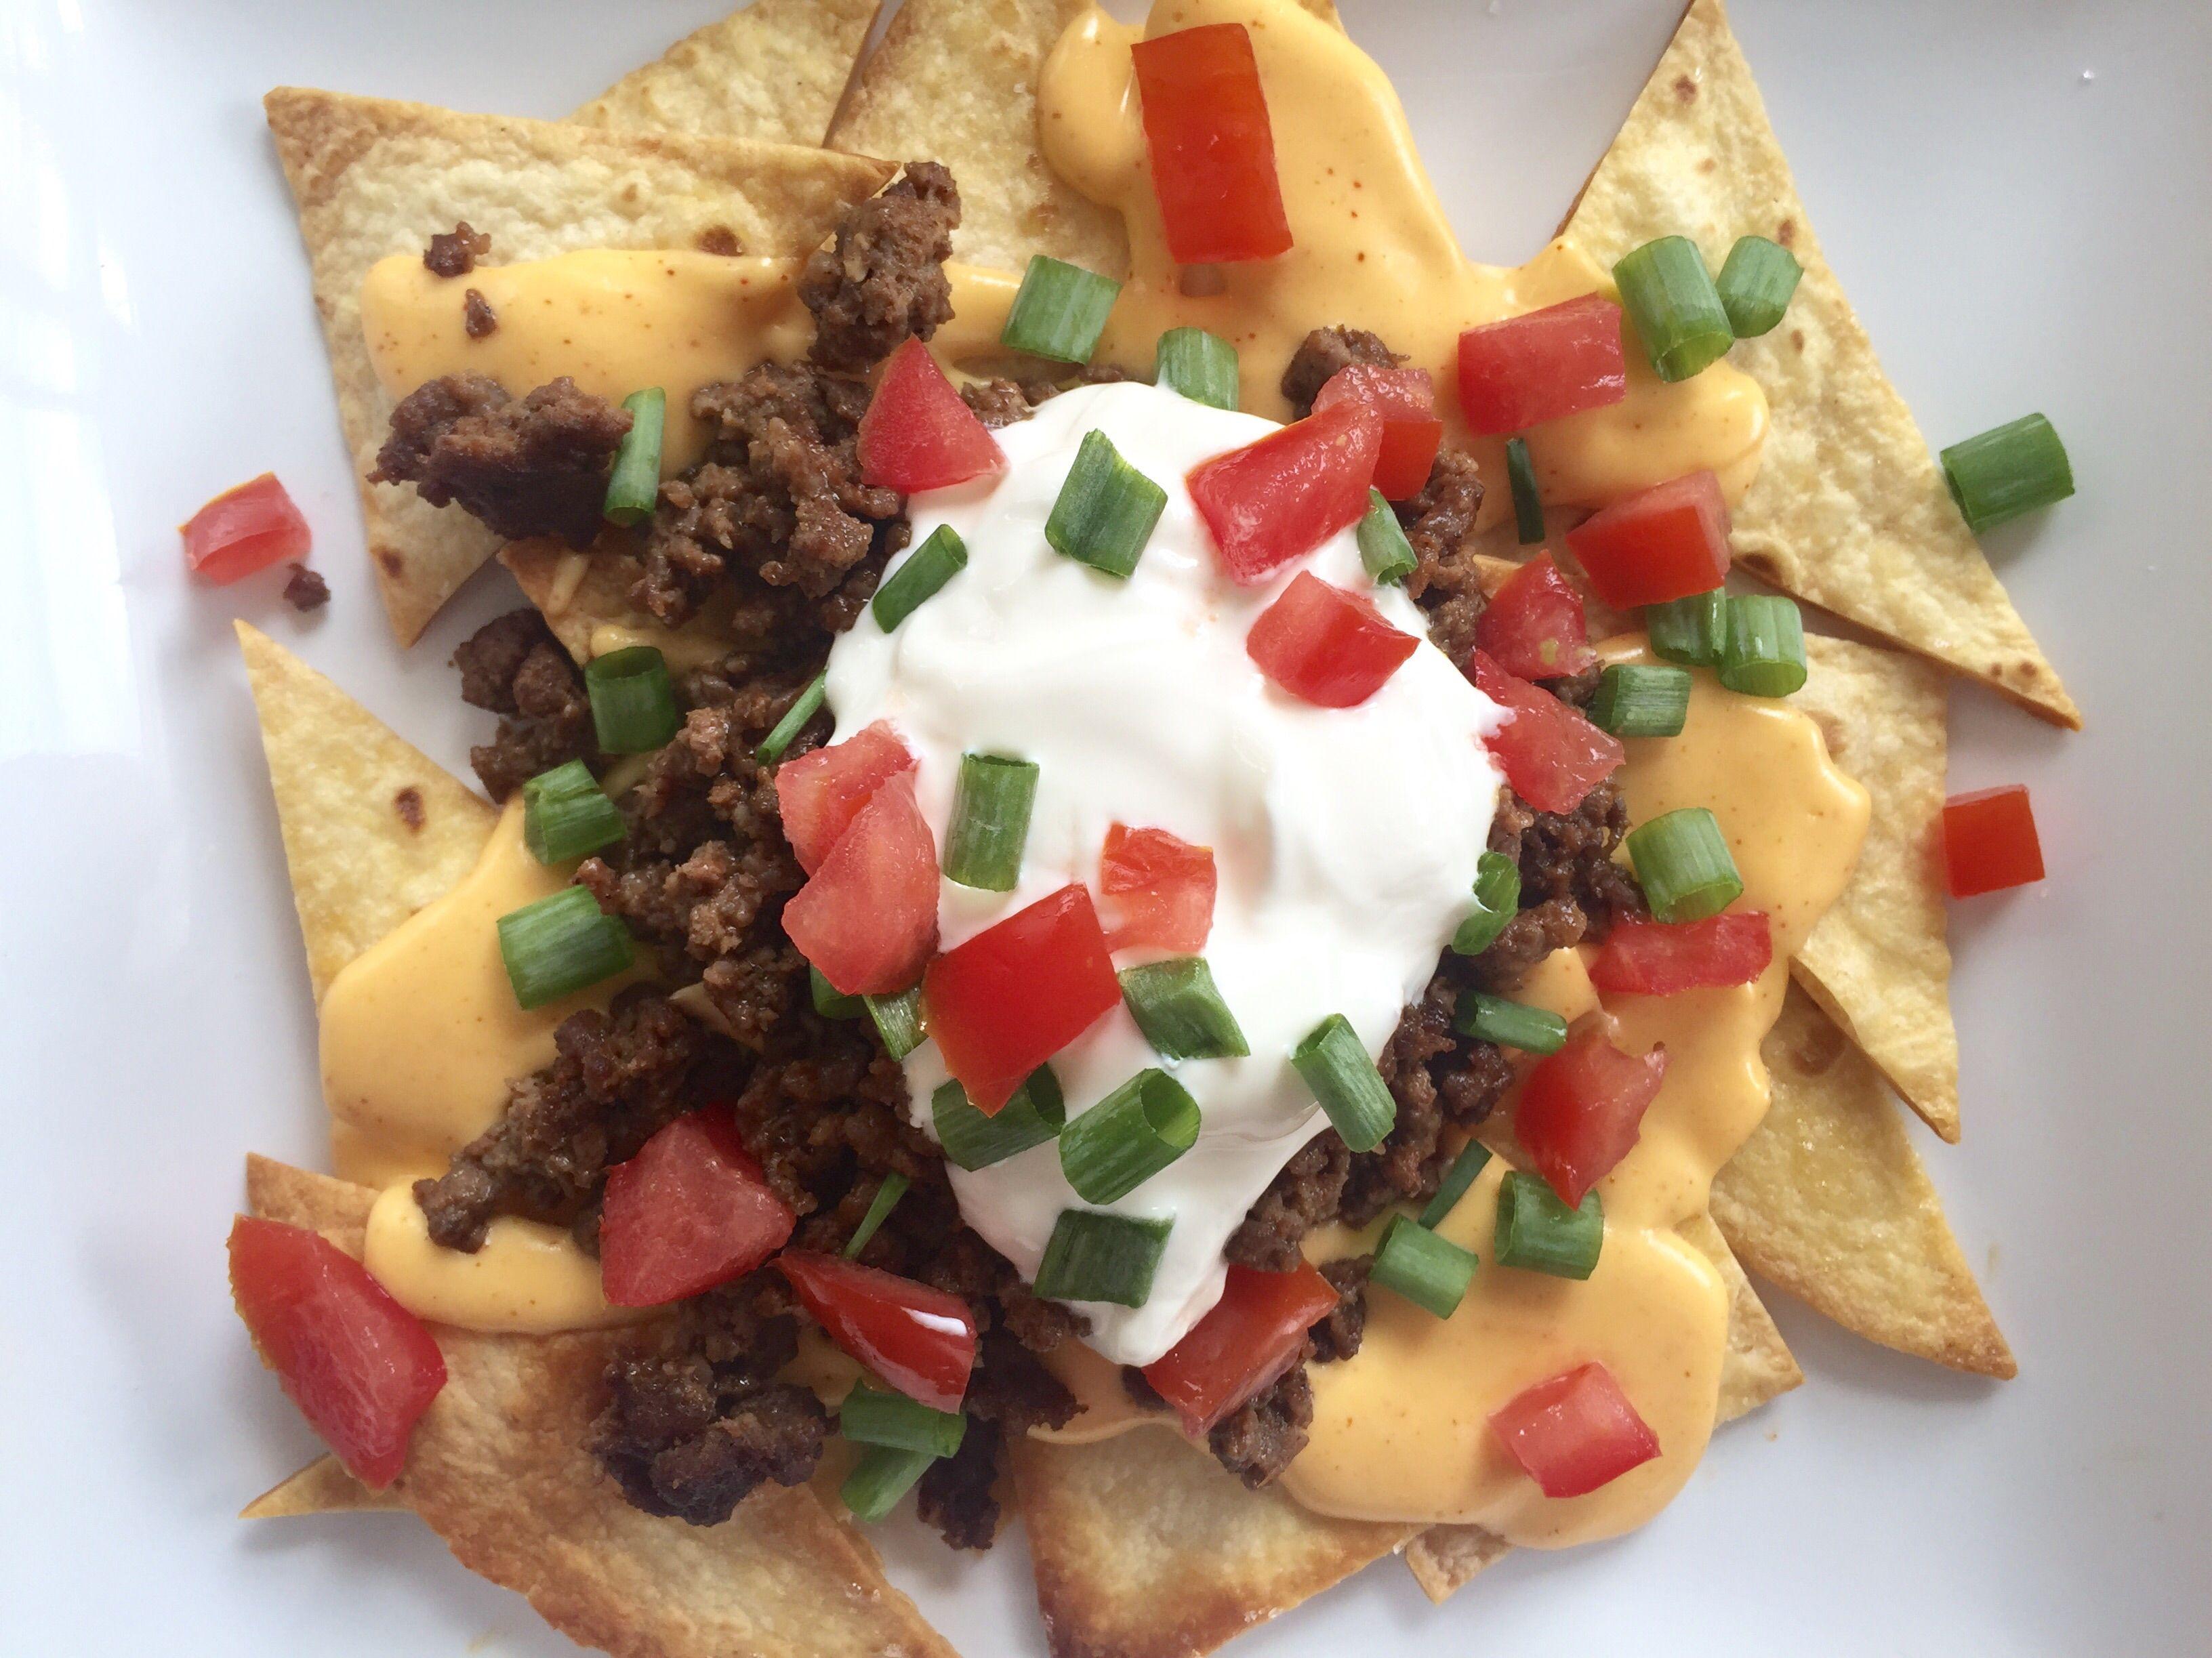 Keto Copycat Recipe Taco Bell Nacho Supreme R Ketorecipes Vegan Fast Food Nachos Supreme Healthy Snacks Recipes